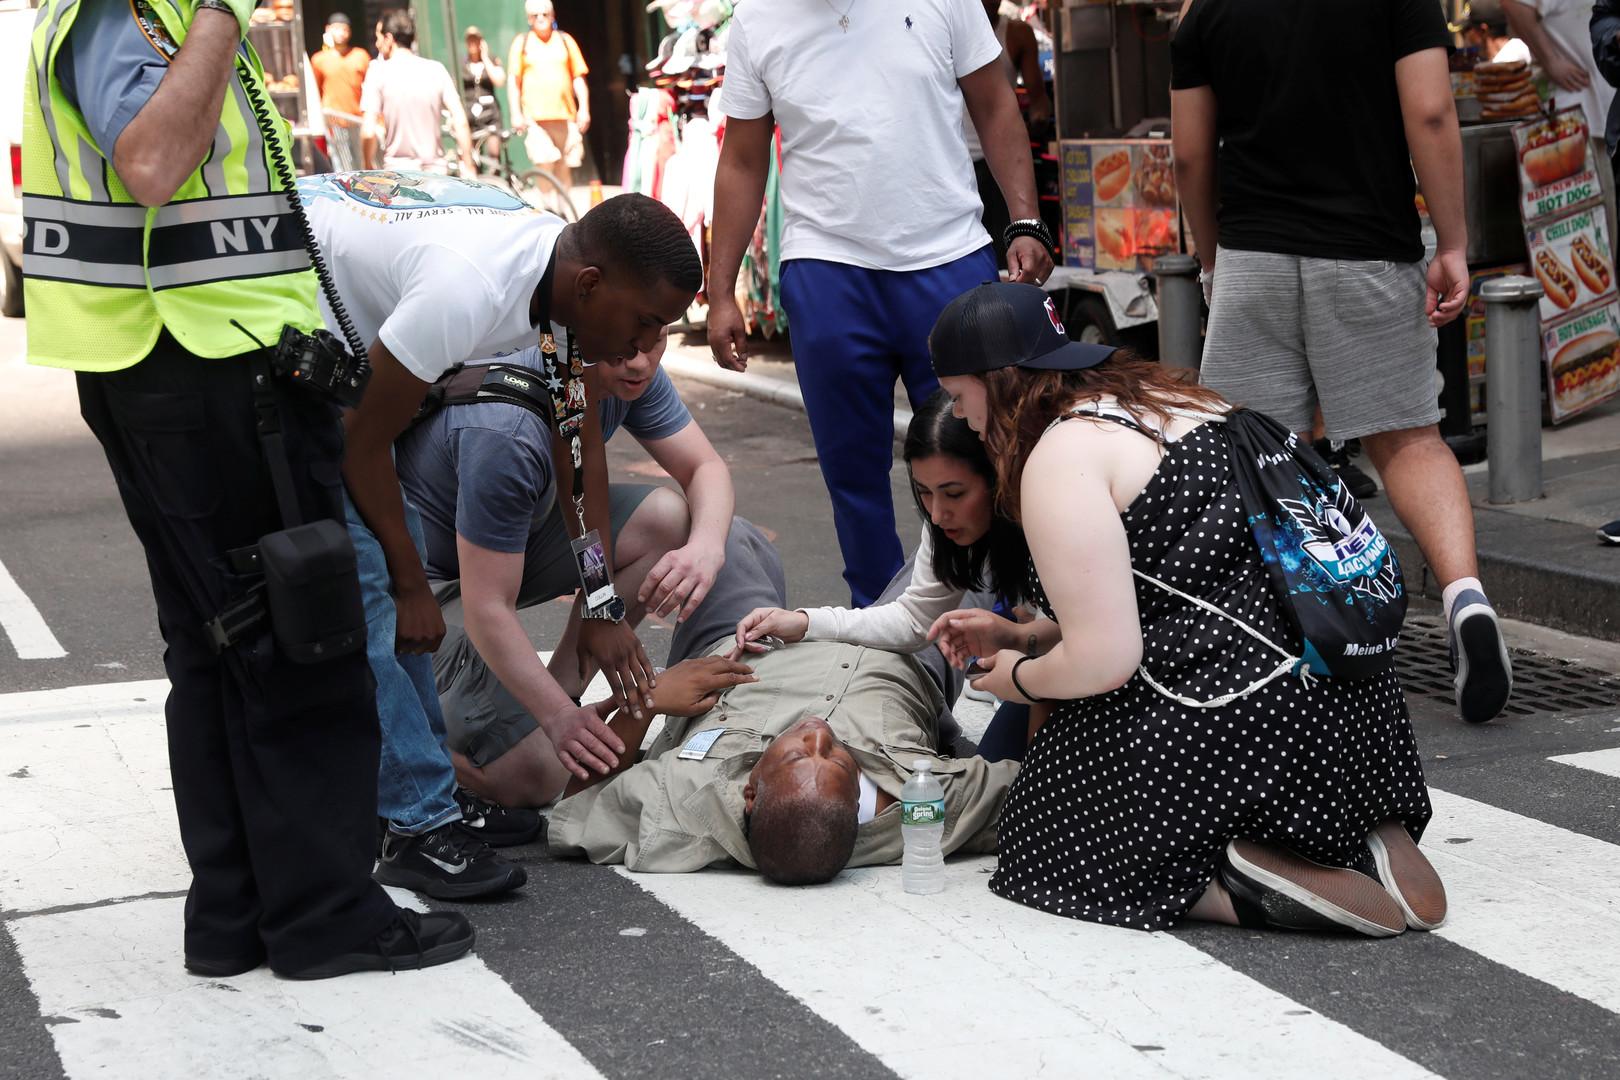 Bilder des Unglücksorts am Times Square